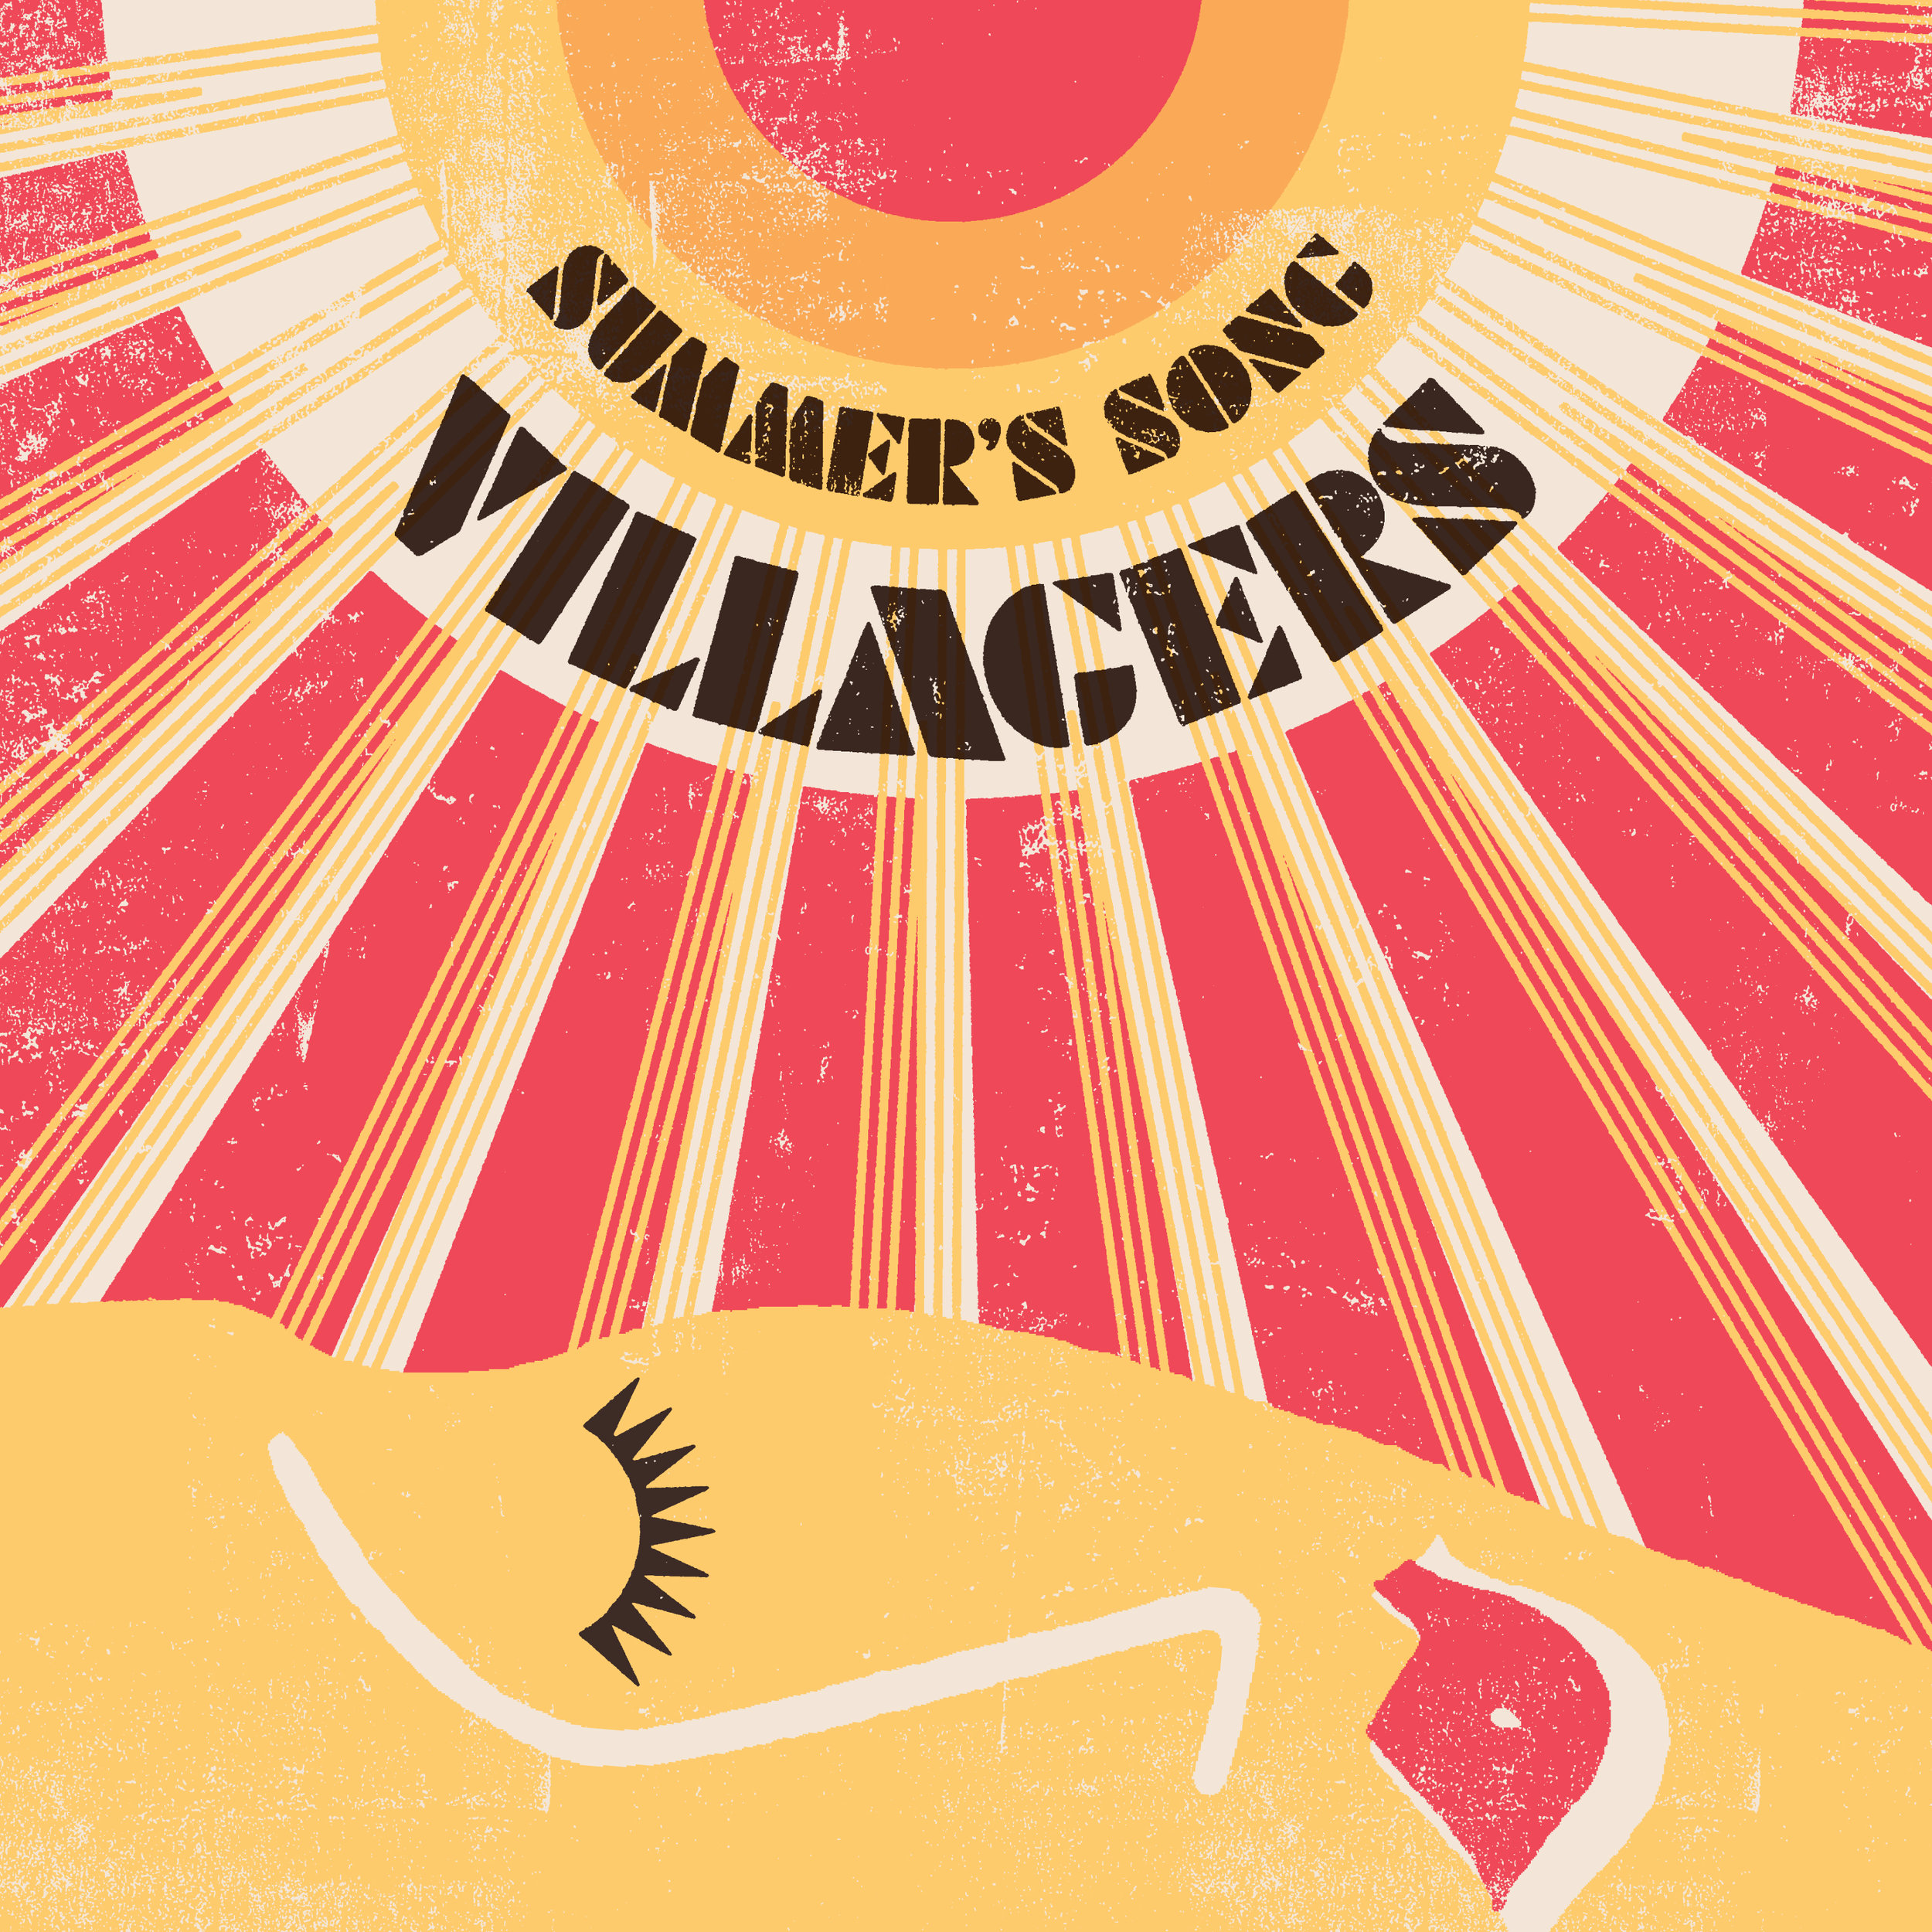 Villagers-Summer'sSong-3000x3000-300dpi-RGB.jpg